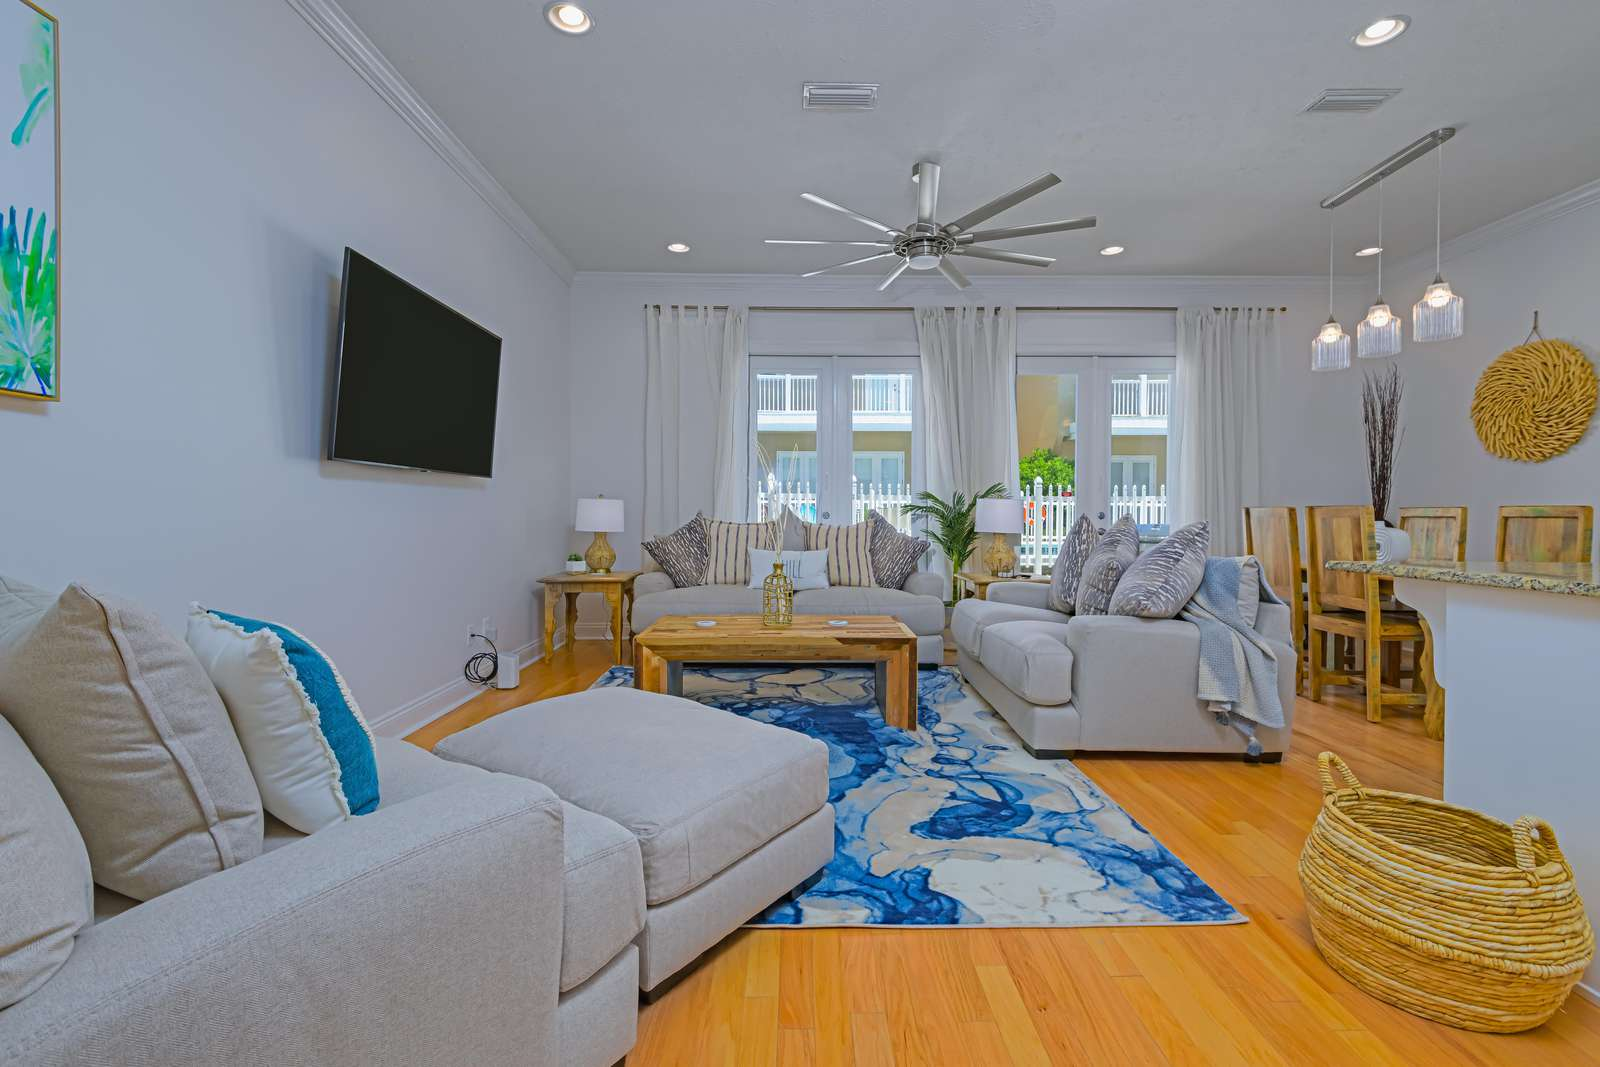 Comfort was in mind when choosing furnishings!